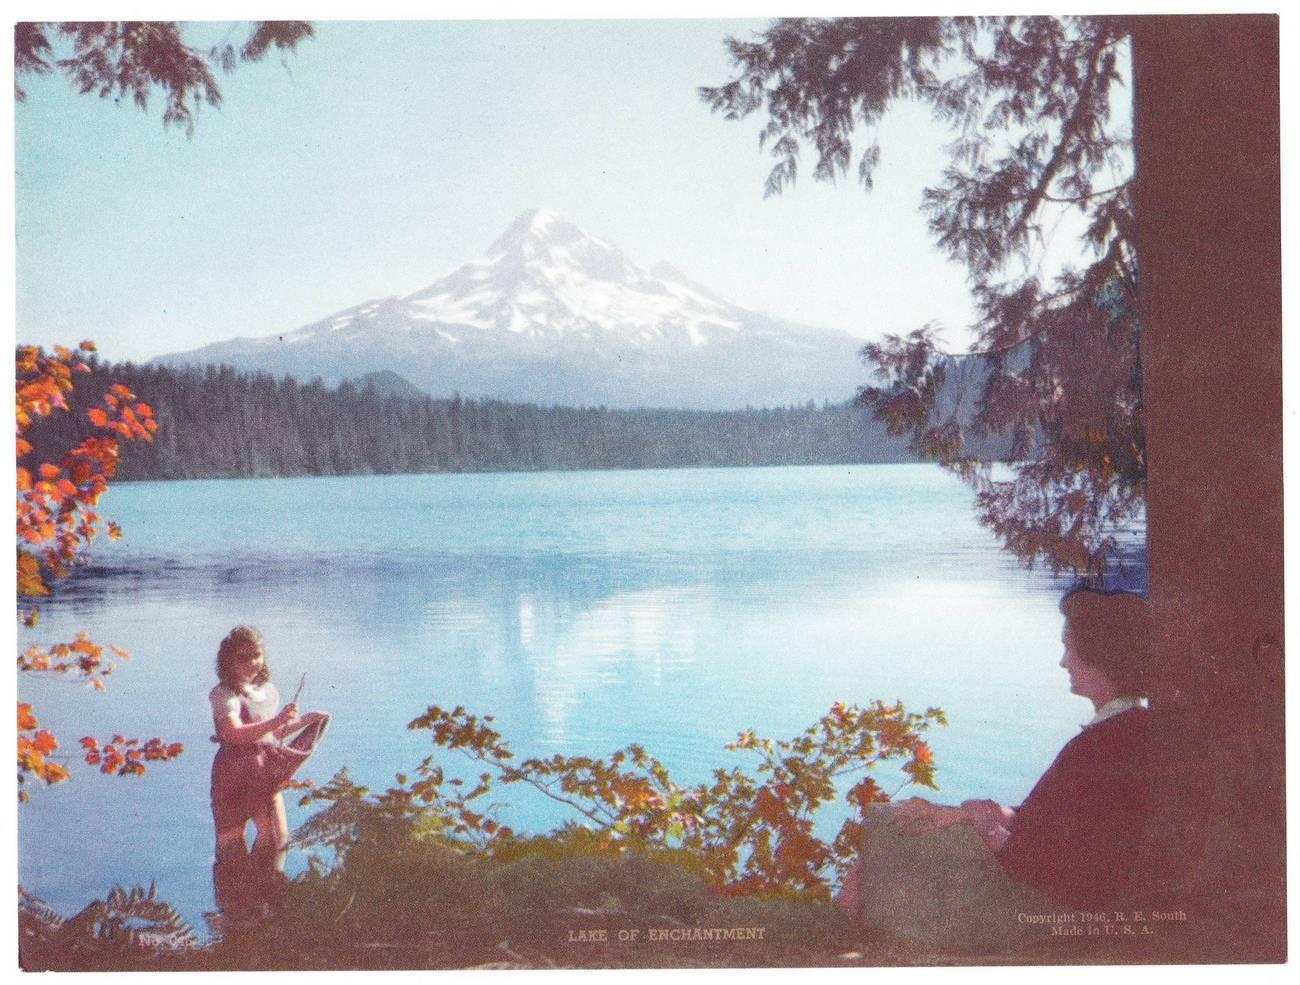 Cp lake of enchantment